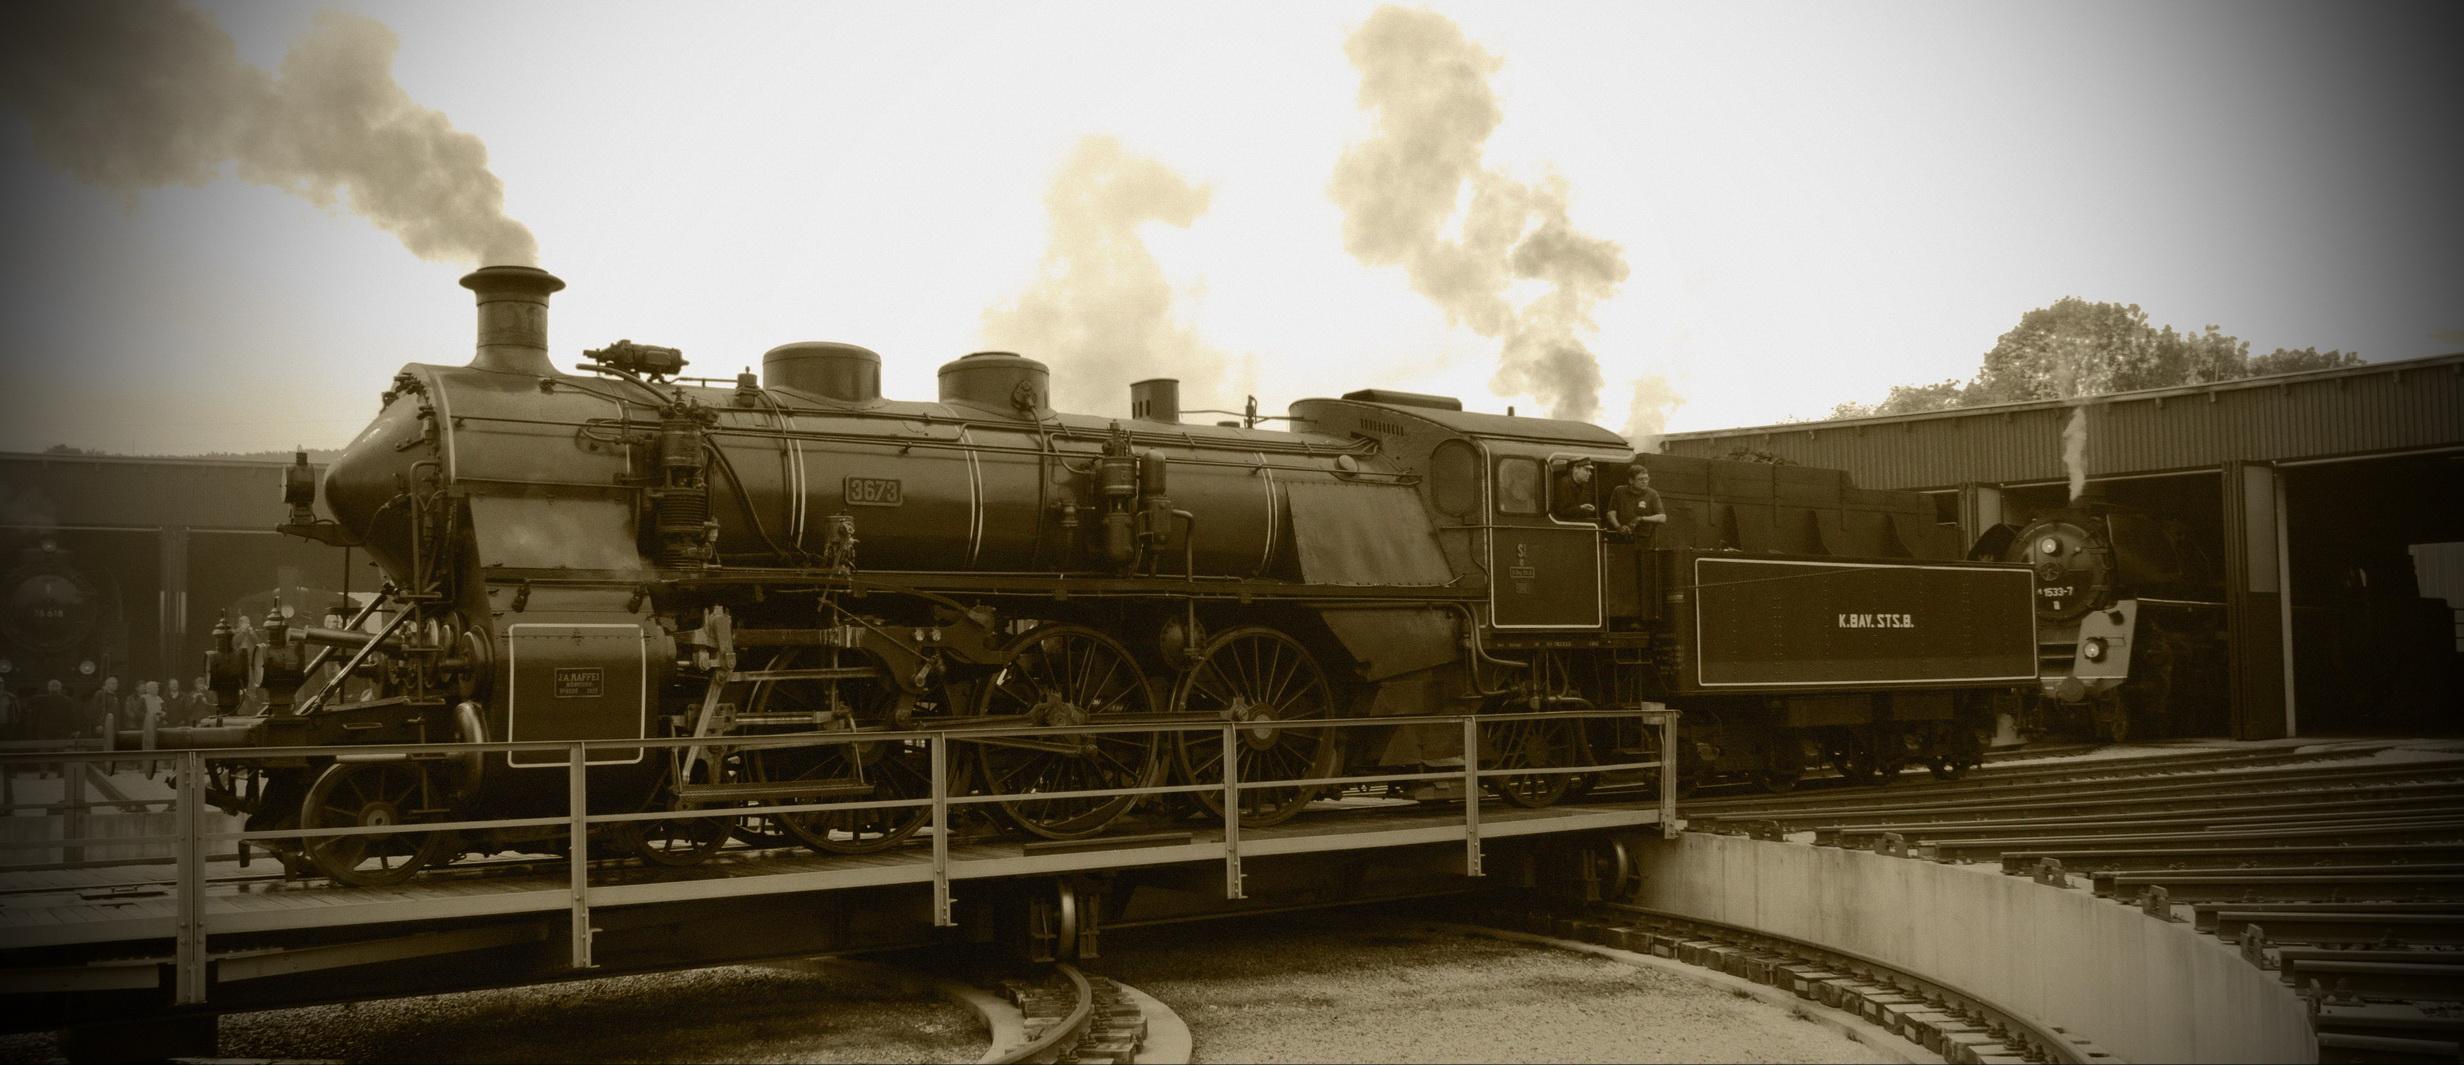 Dampflokomotive 18 478 (bay. S 3/6)